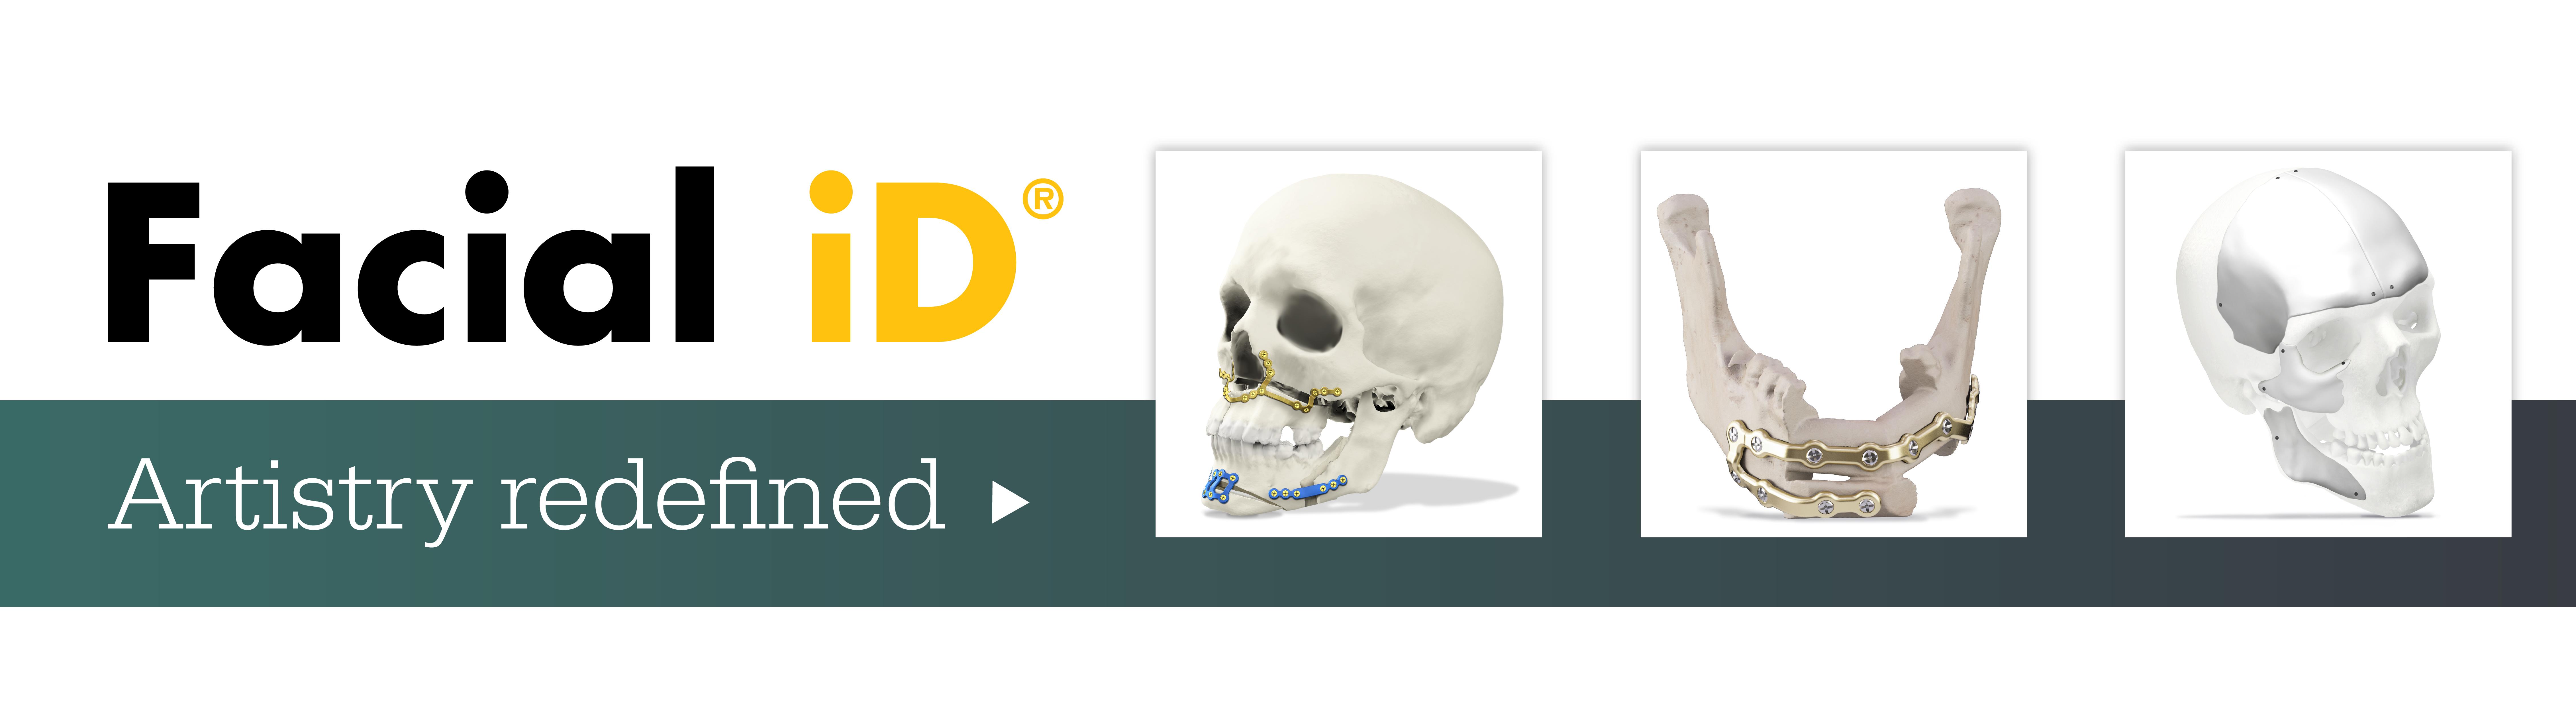 Facial iD Banner 2020